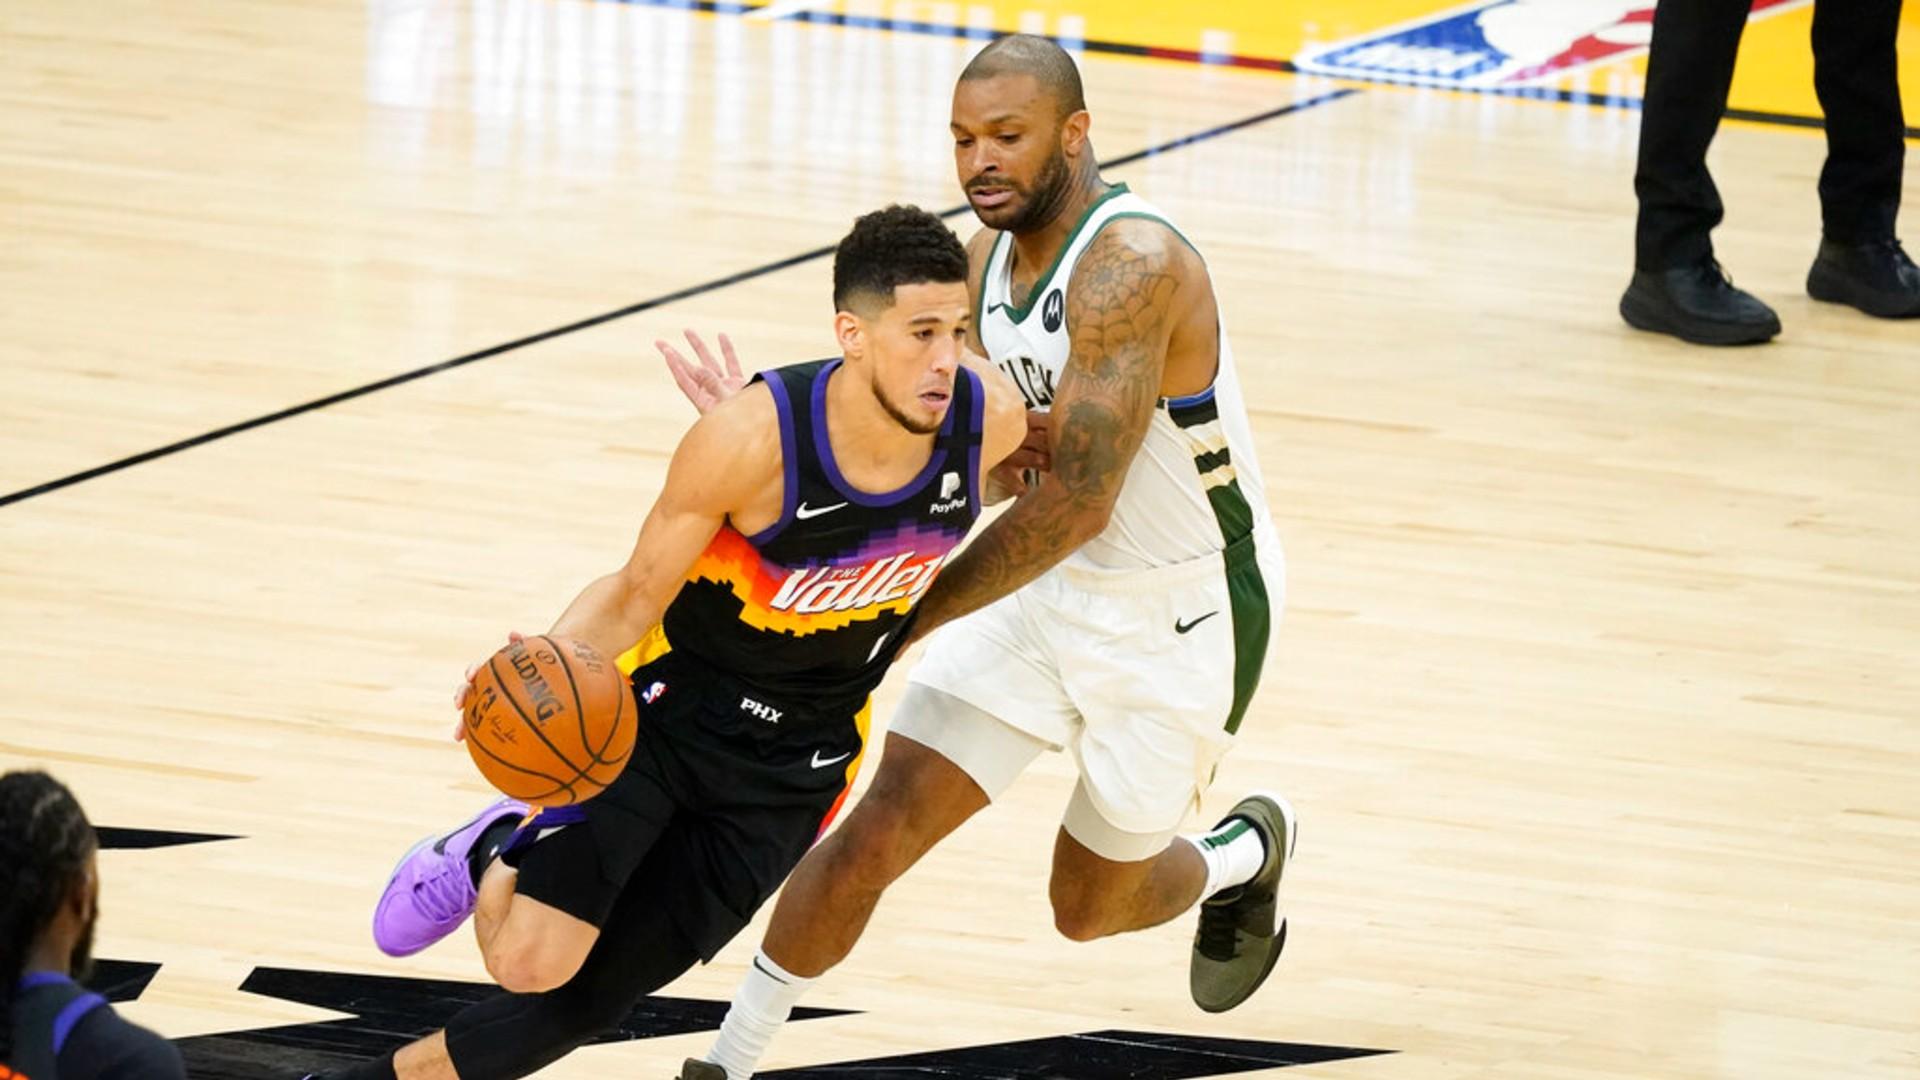 Phoenix Suns guard Devin Booker, left, dribbles against Milwaukee Bucks forward P.J. Tucker during the first half of Game 2 of basketball's NBA Finals, Thursday, July 8, 2021, in Phoenix. (AP Photo/Matt York)